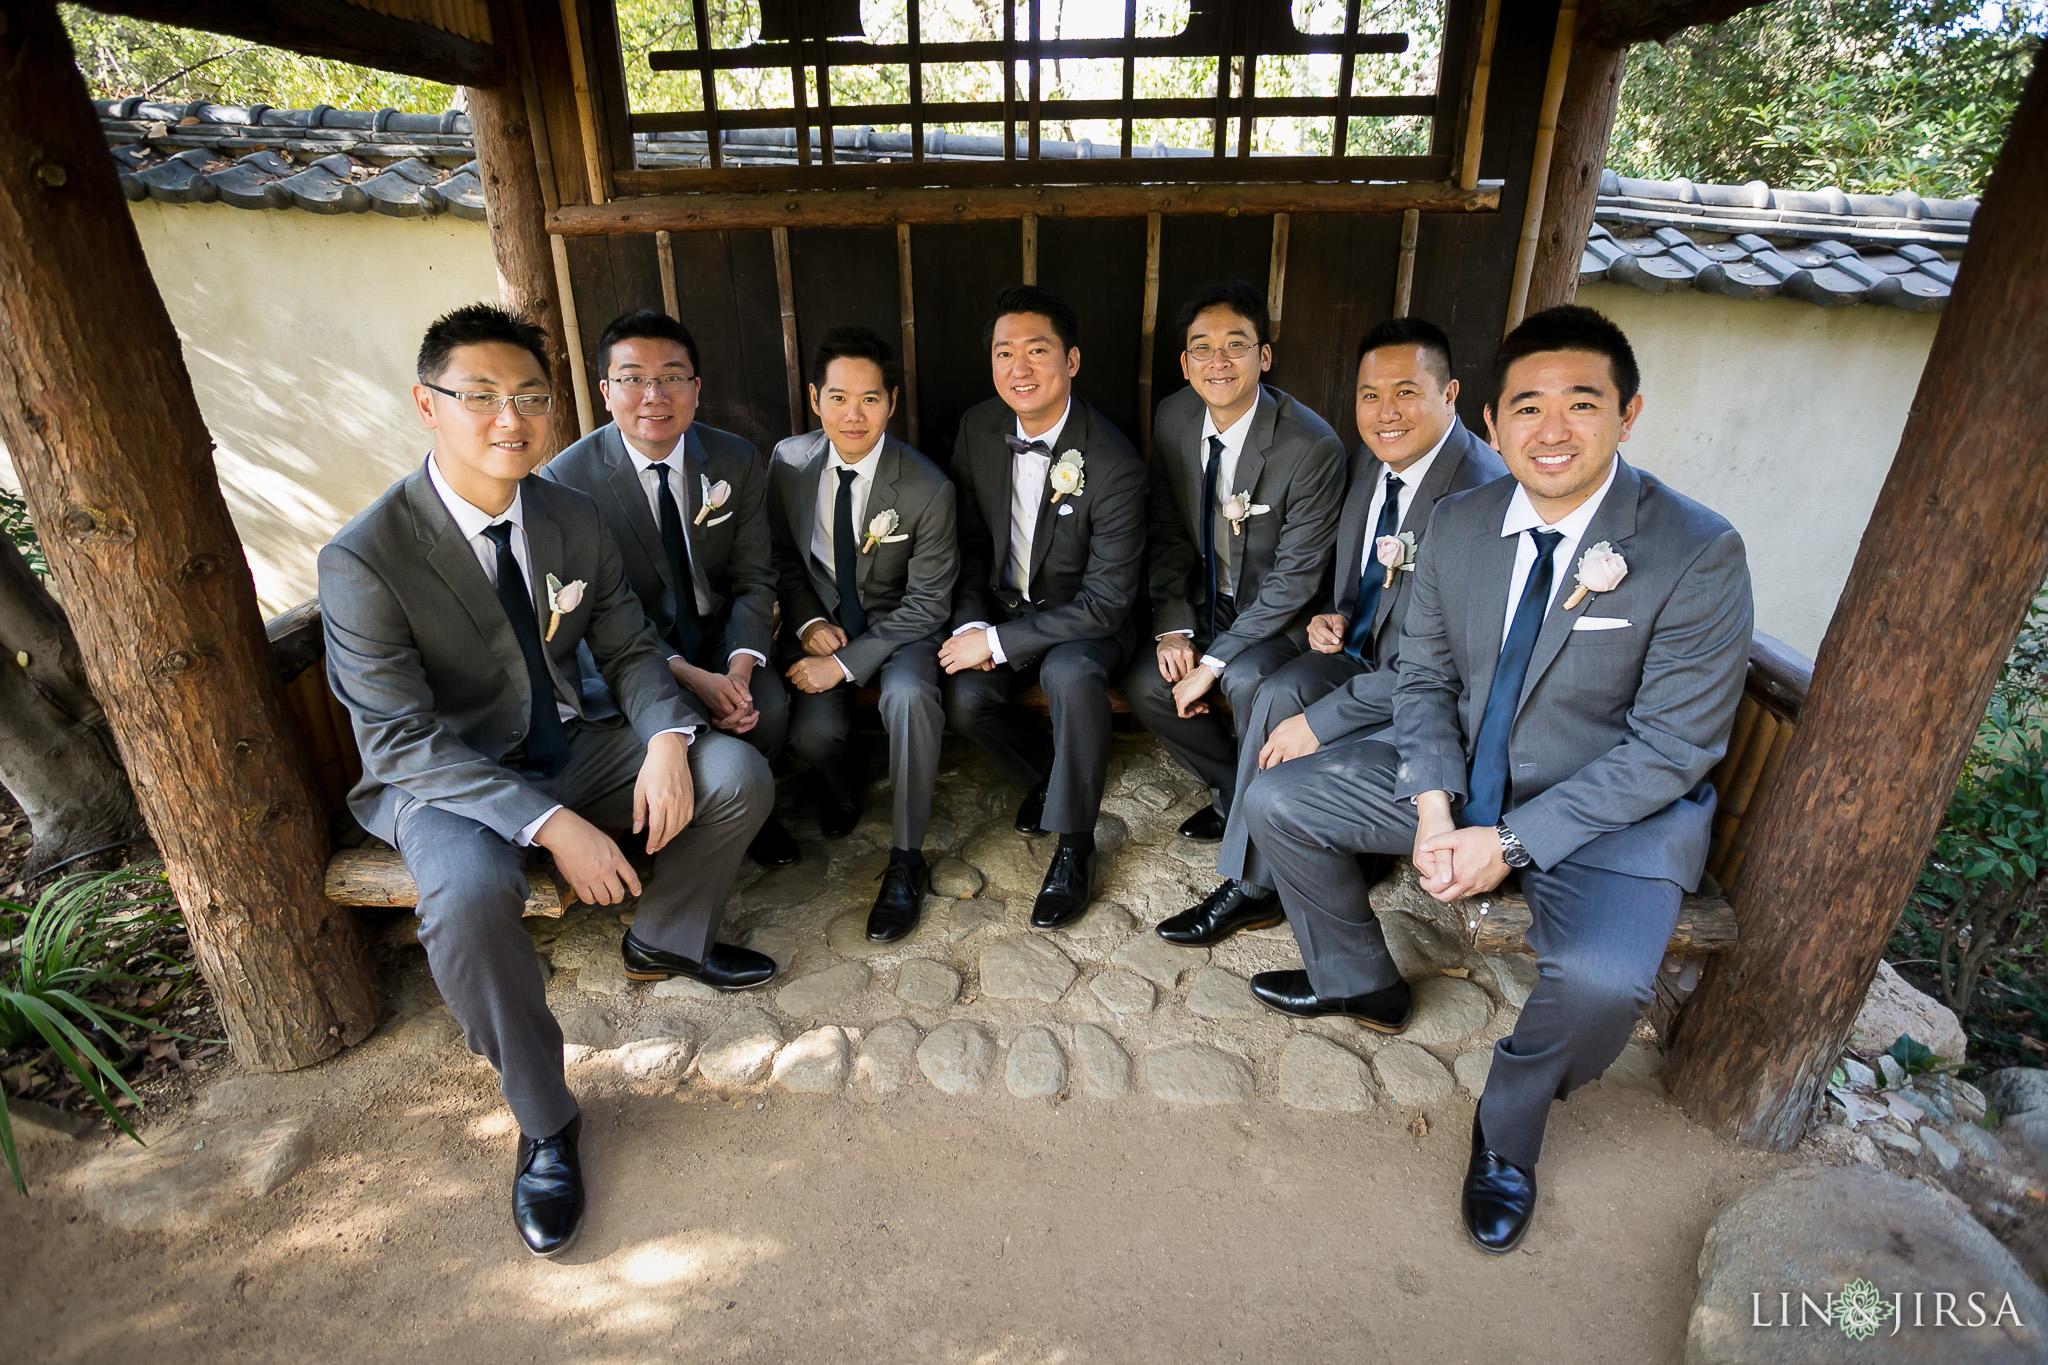 07-storrier-stearns-japanese-gardens-wedding-photography